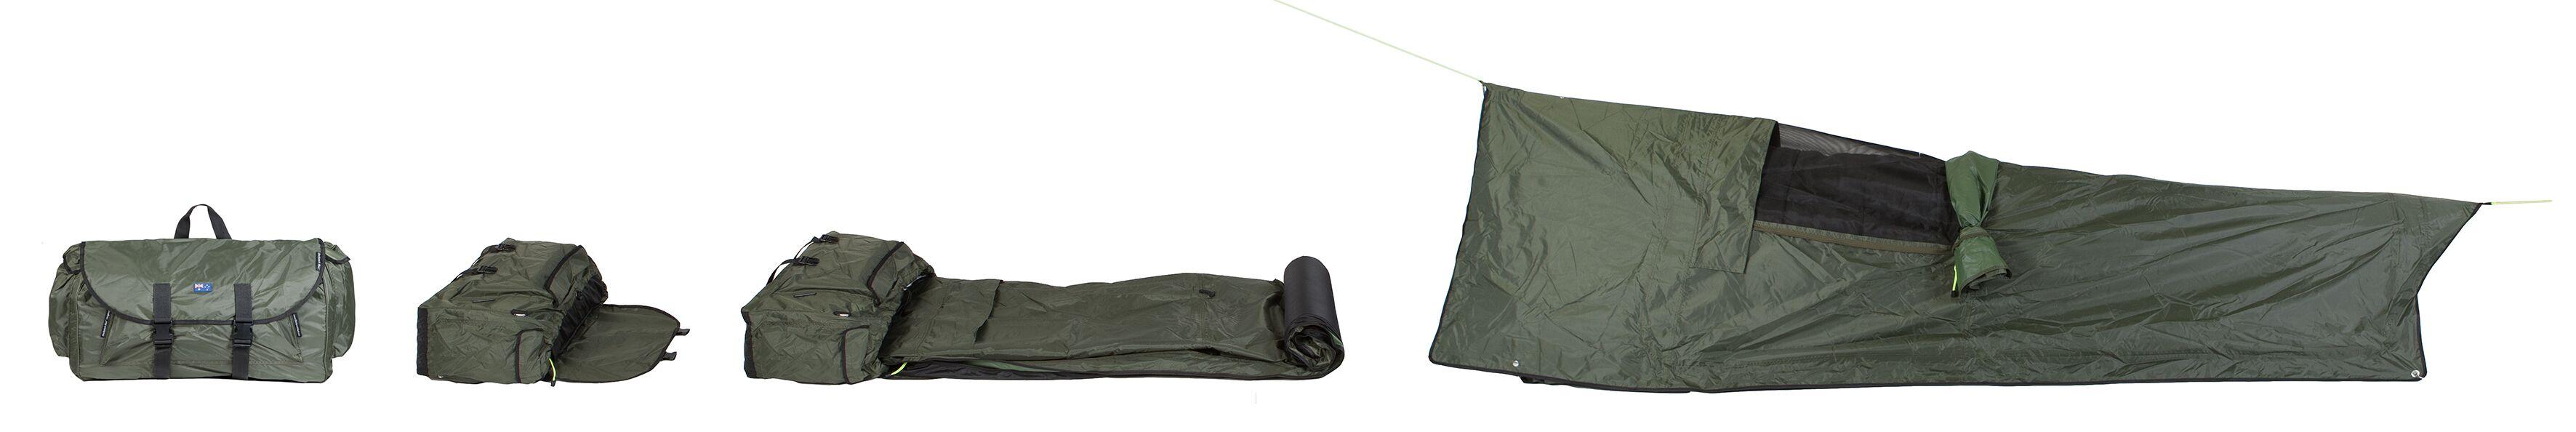 Backpacker bed